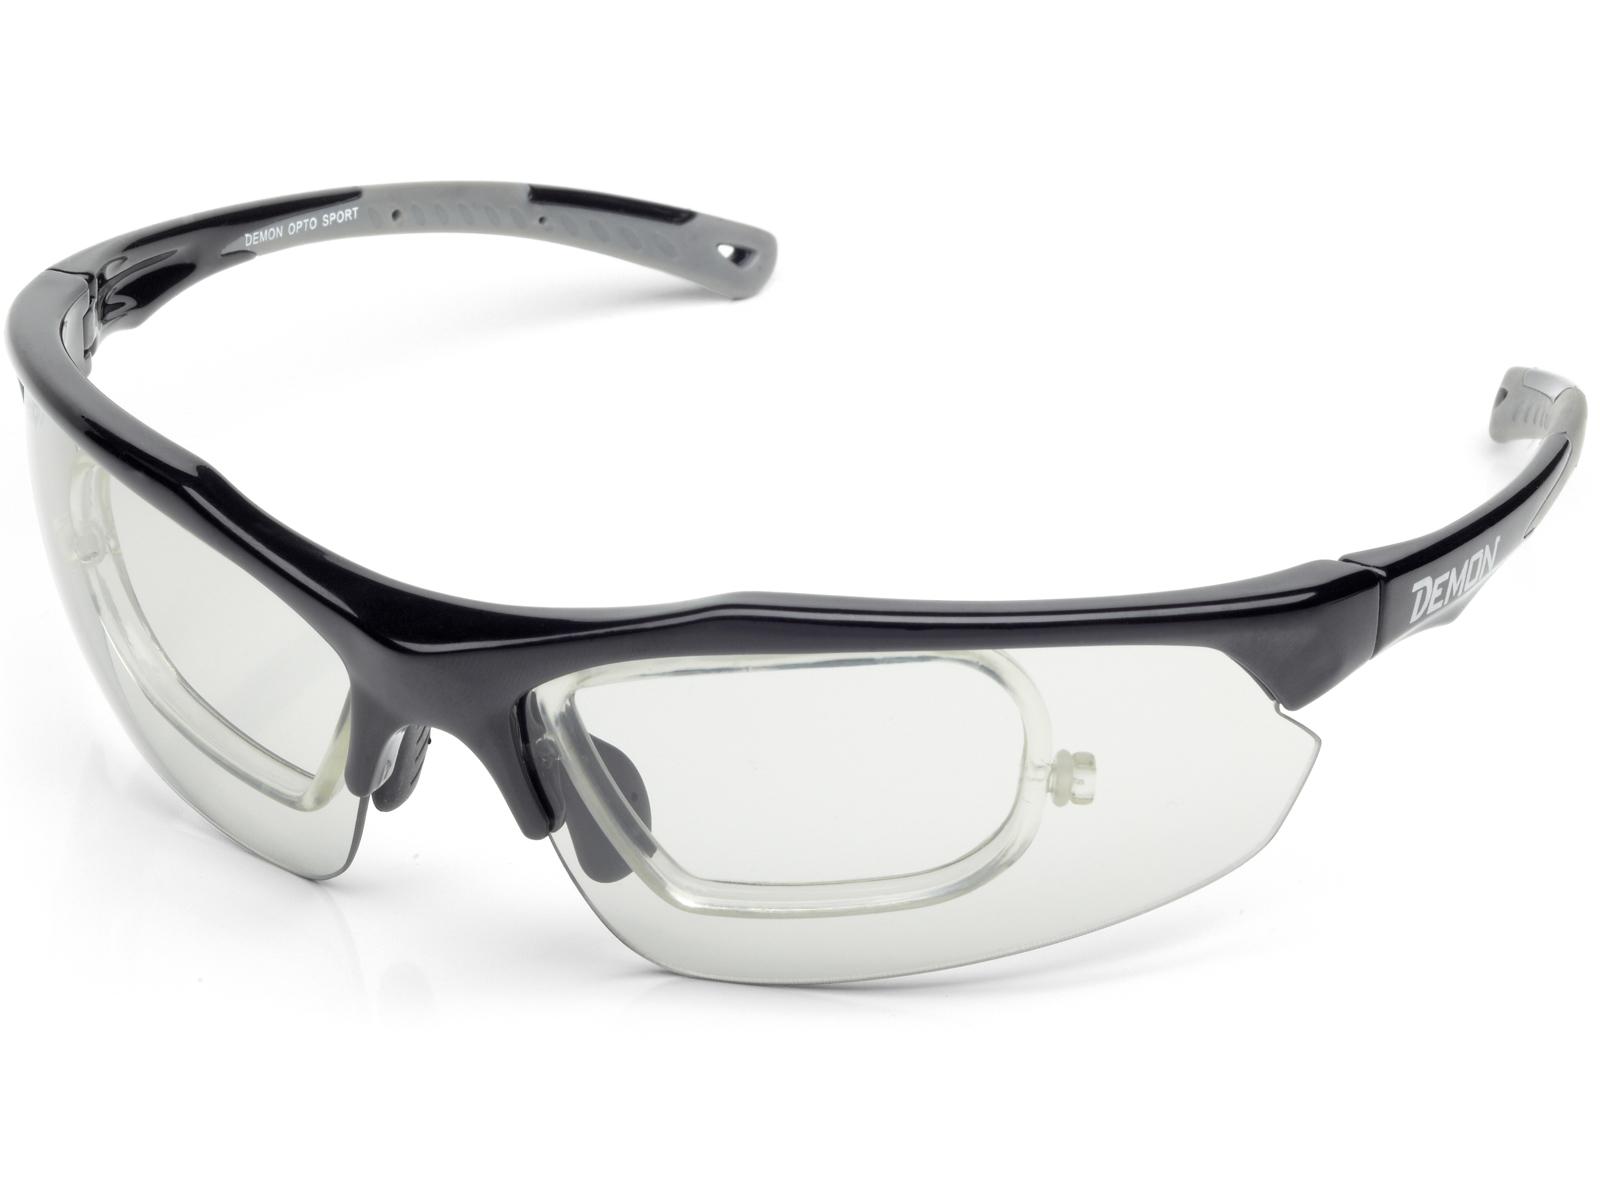 Cykelbriller med styrke